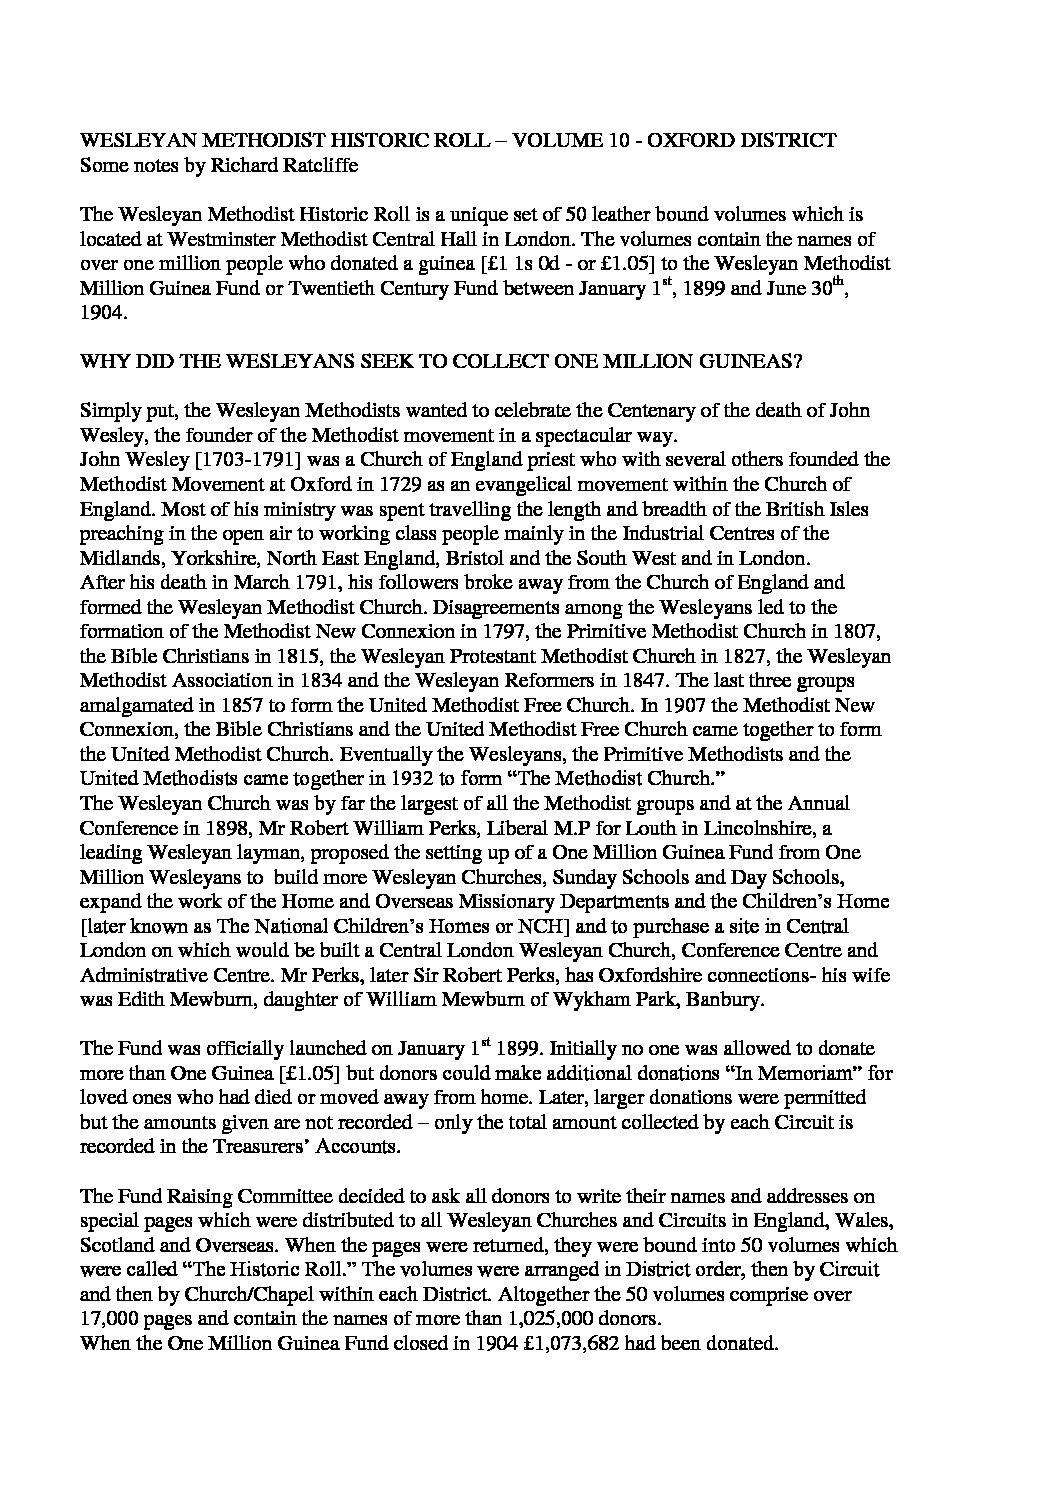 Wesleyan Historic Roll volume 10